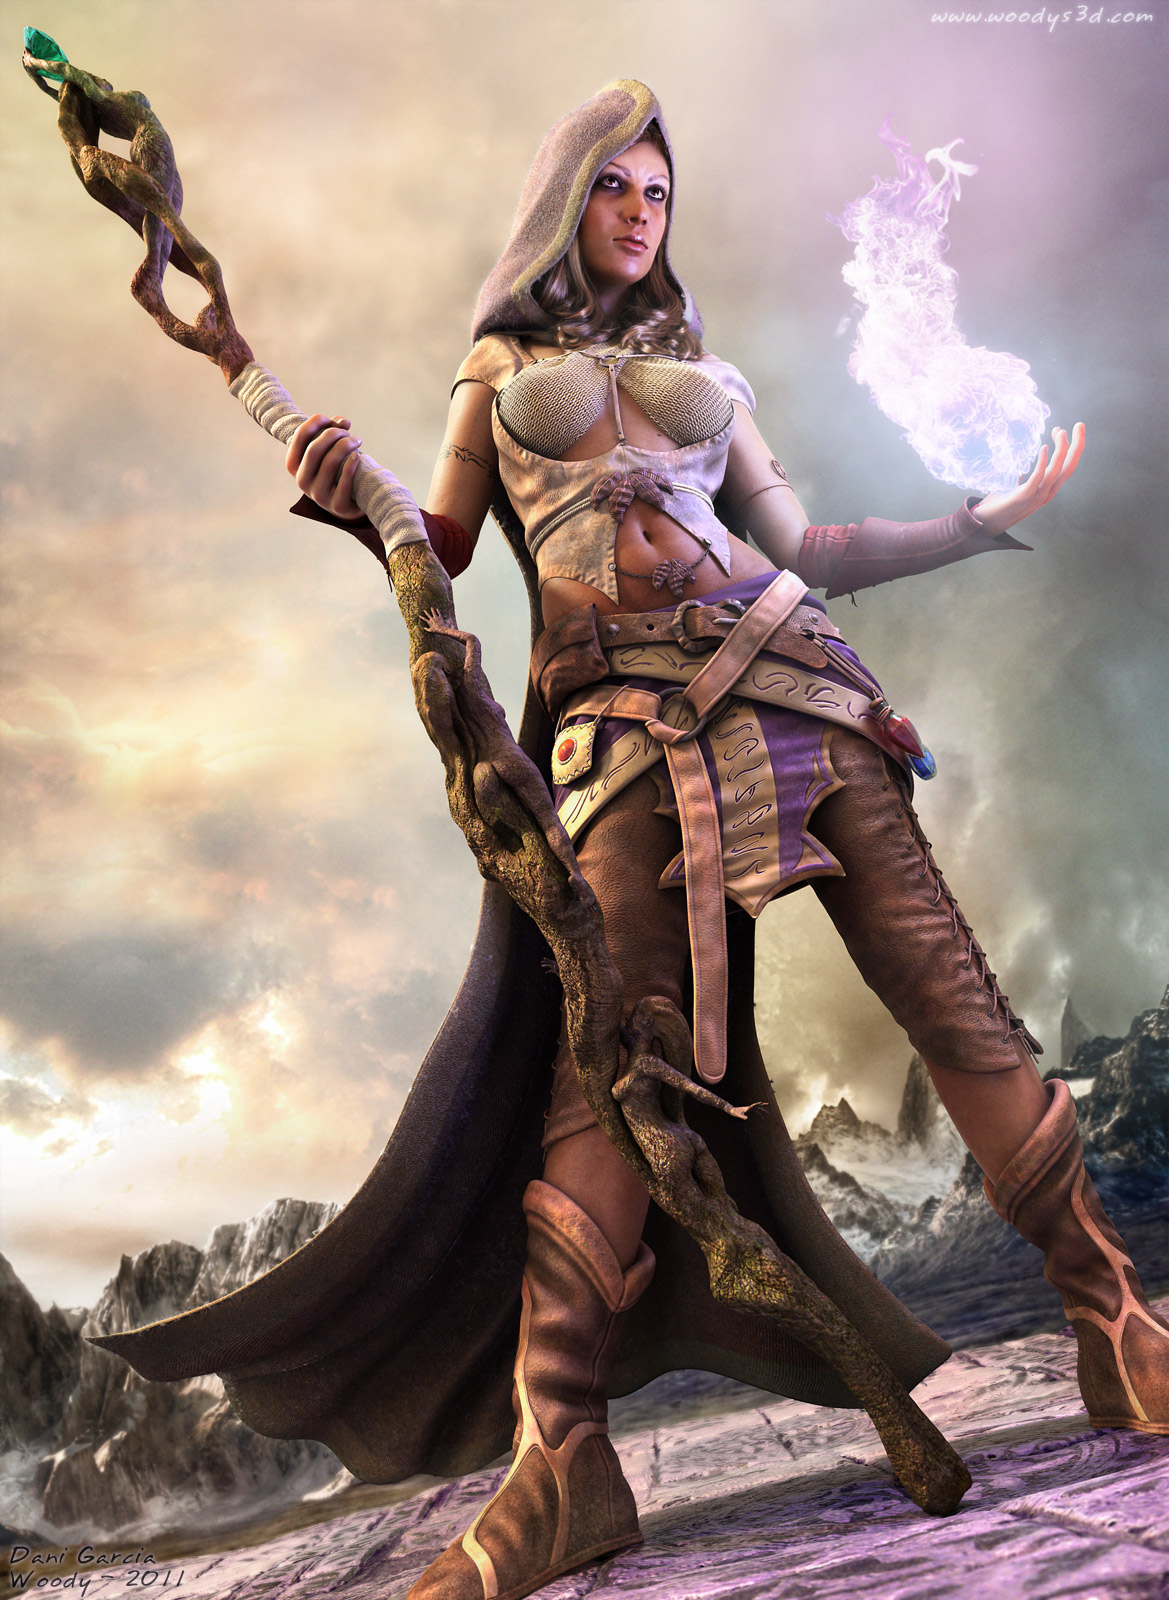 3d fantasy art women xxx streaming